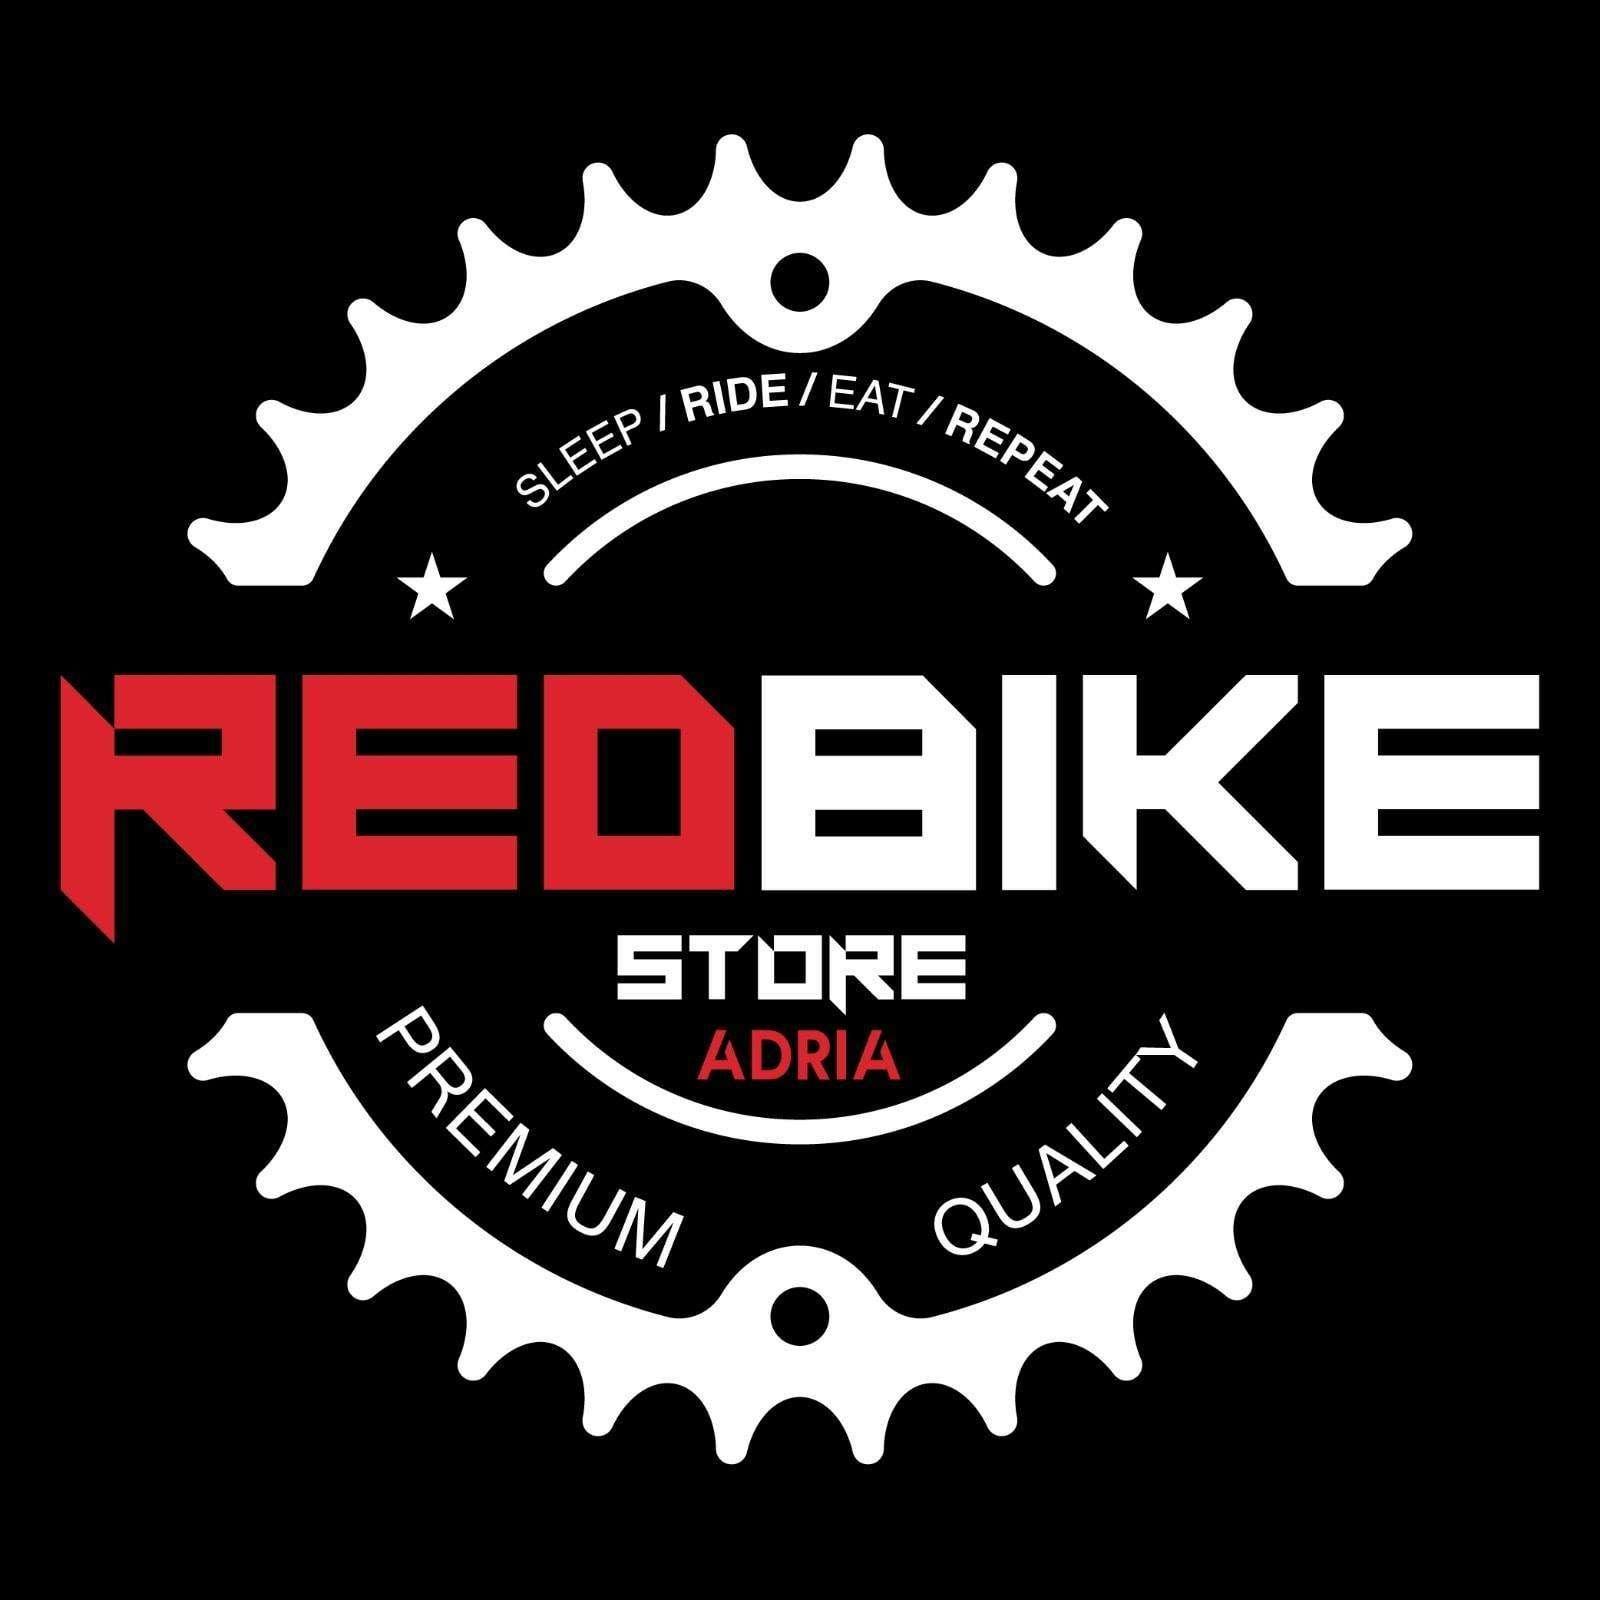 RedBike Store